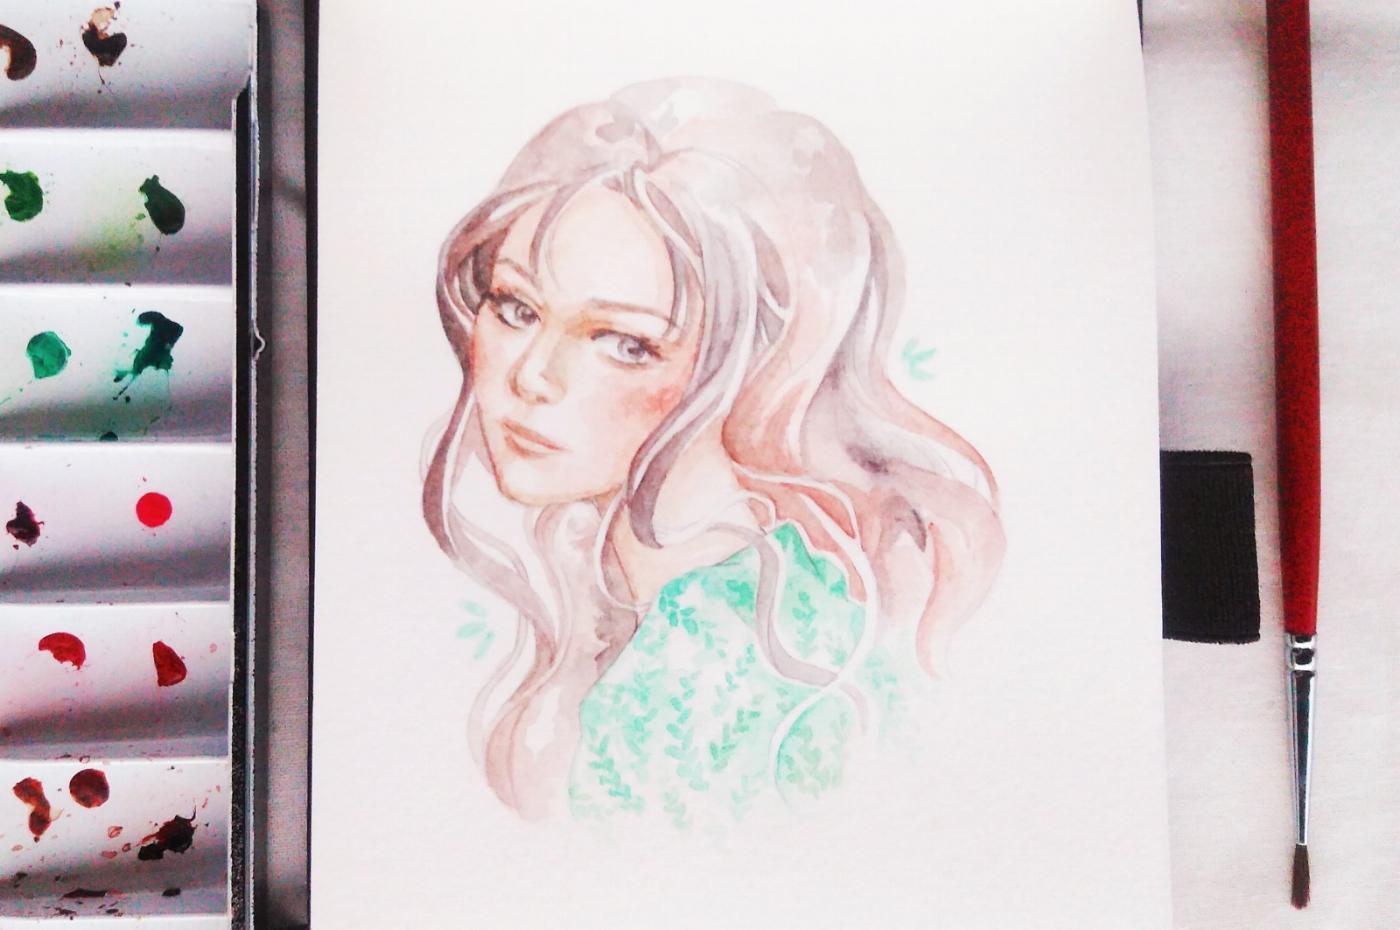 characters fanart Custom pencil artwork flowers and more!! portraits